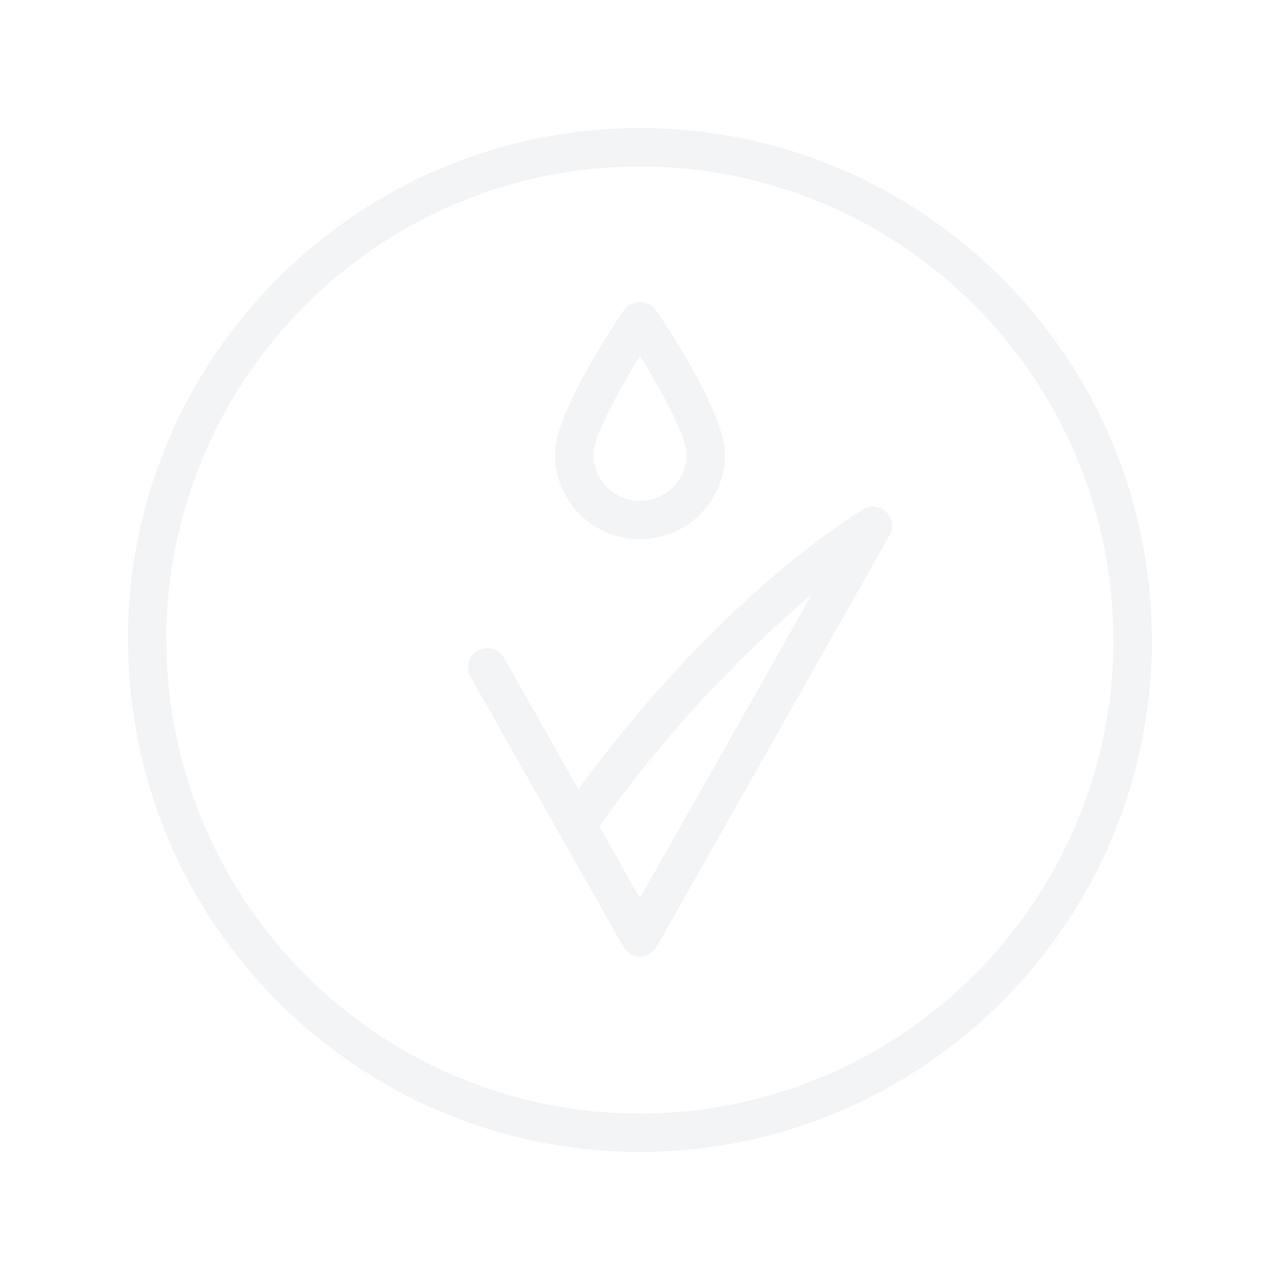 SCHWARZKOPF PROFESSIONAL Blond Me Keratin Restore Bonding Cleansing Conditioner 500ml